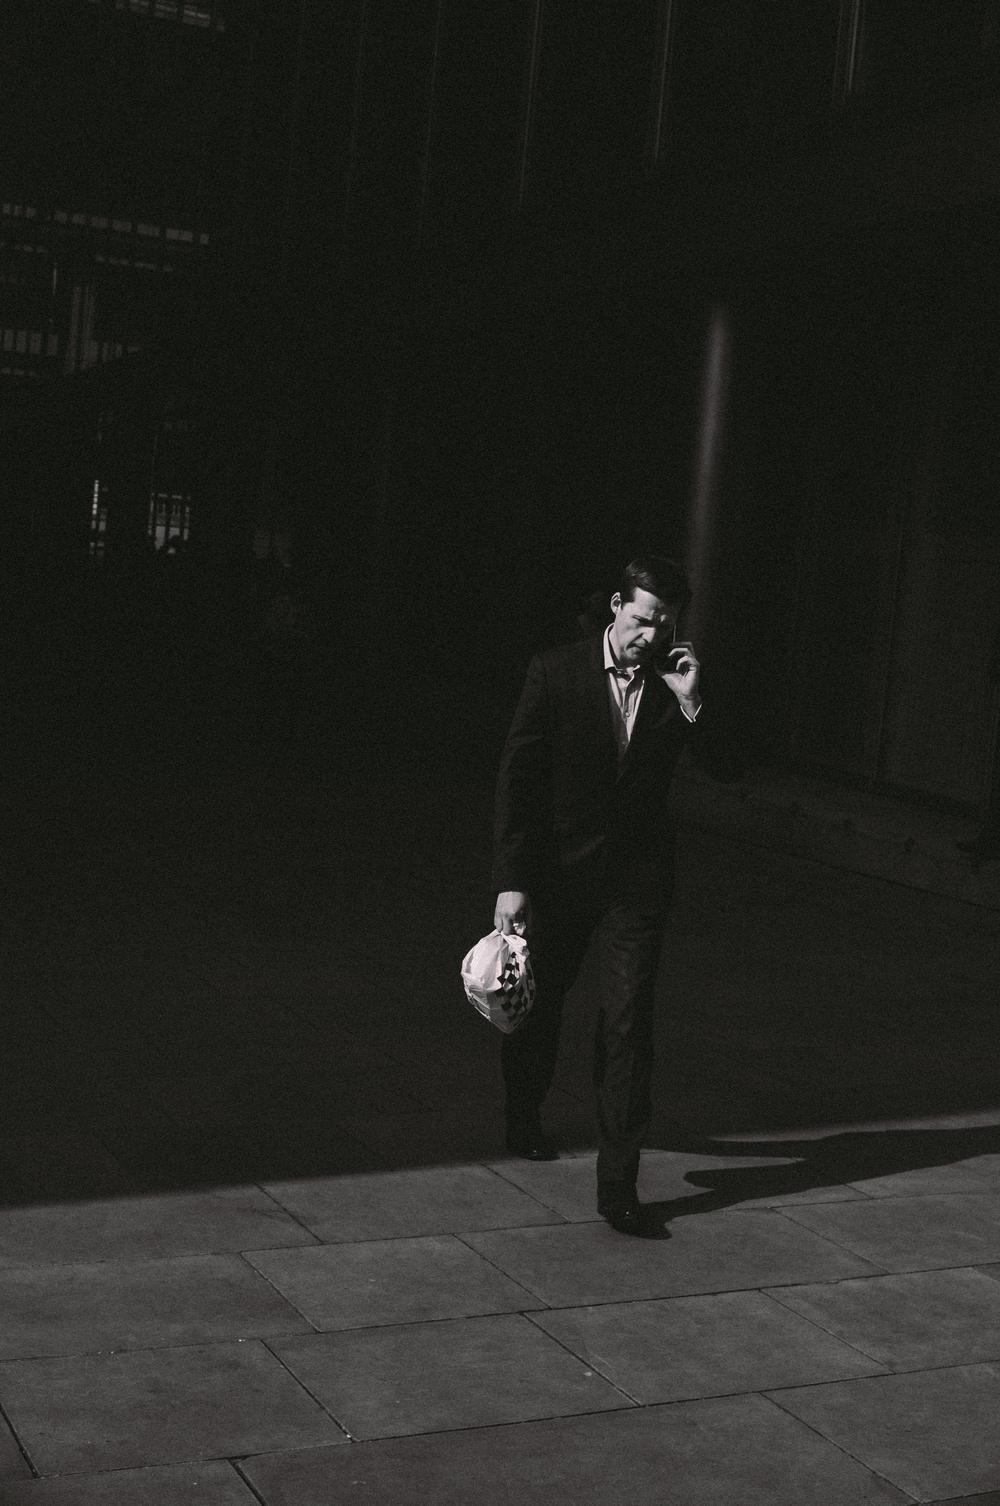 x100 street photography-1-6.jpg